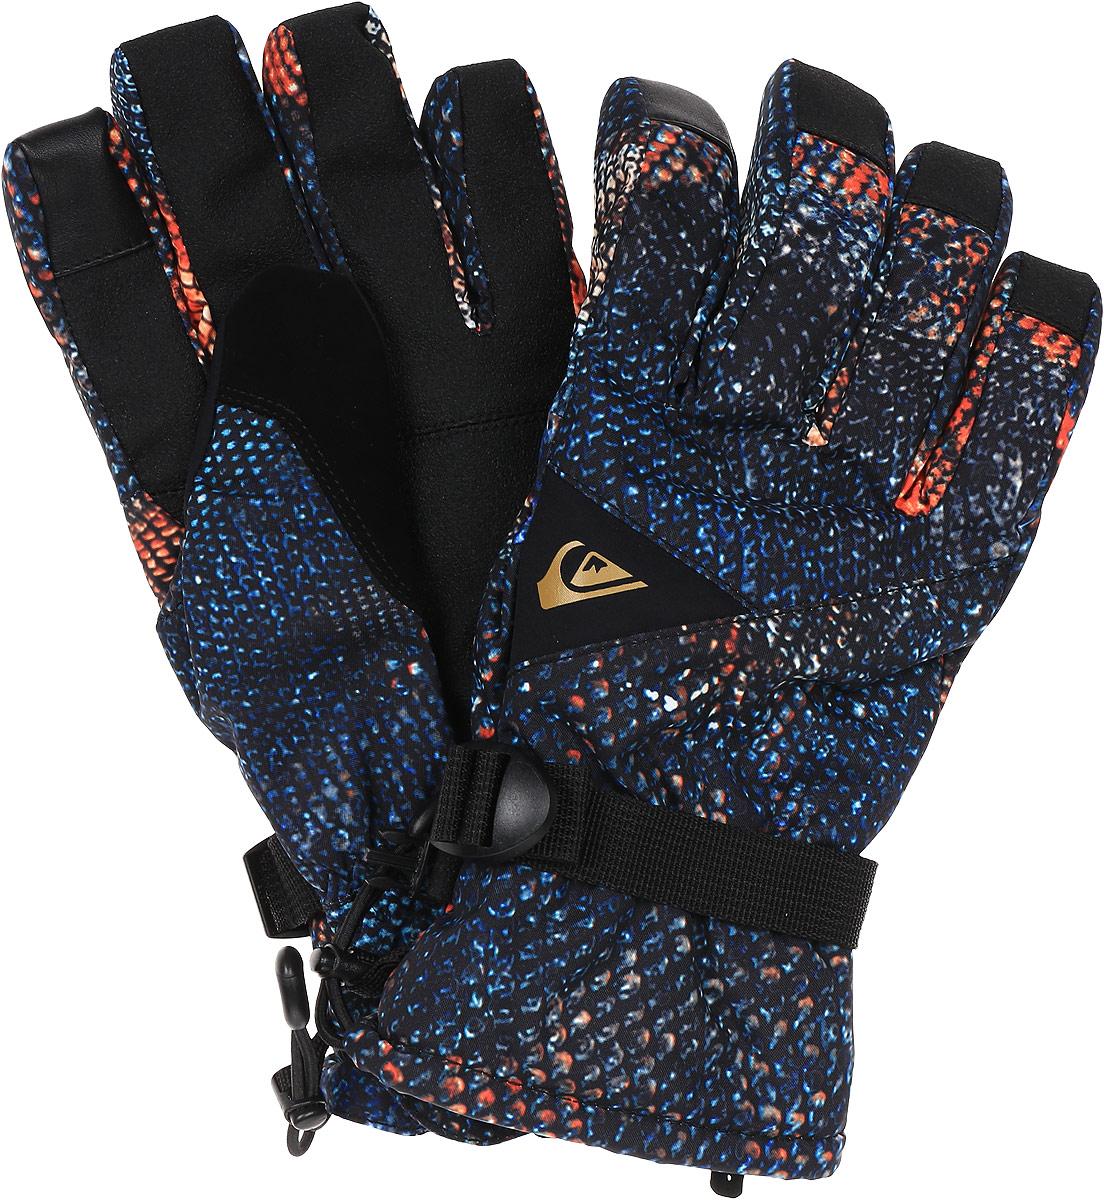 Перчатки мужские Quiksilver, цвет: черный. EQYHN03097-NMS9. Размер M (8)EQYHN03097-NMS9